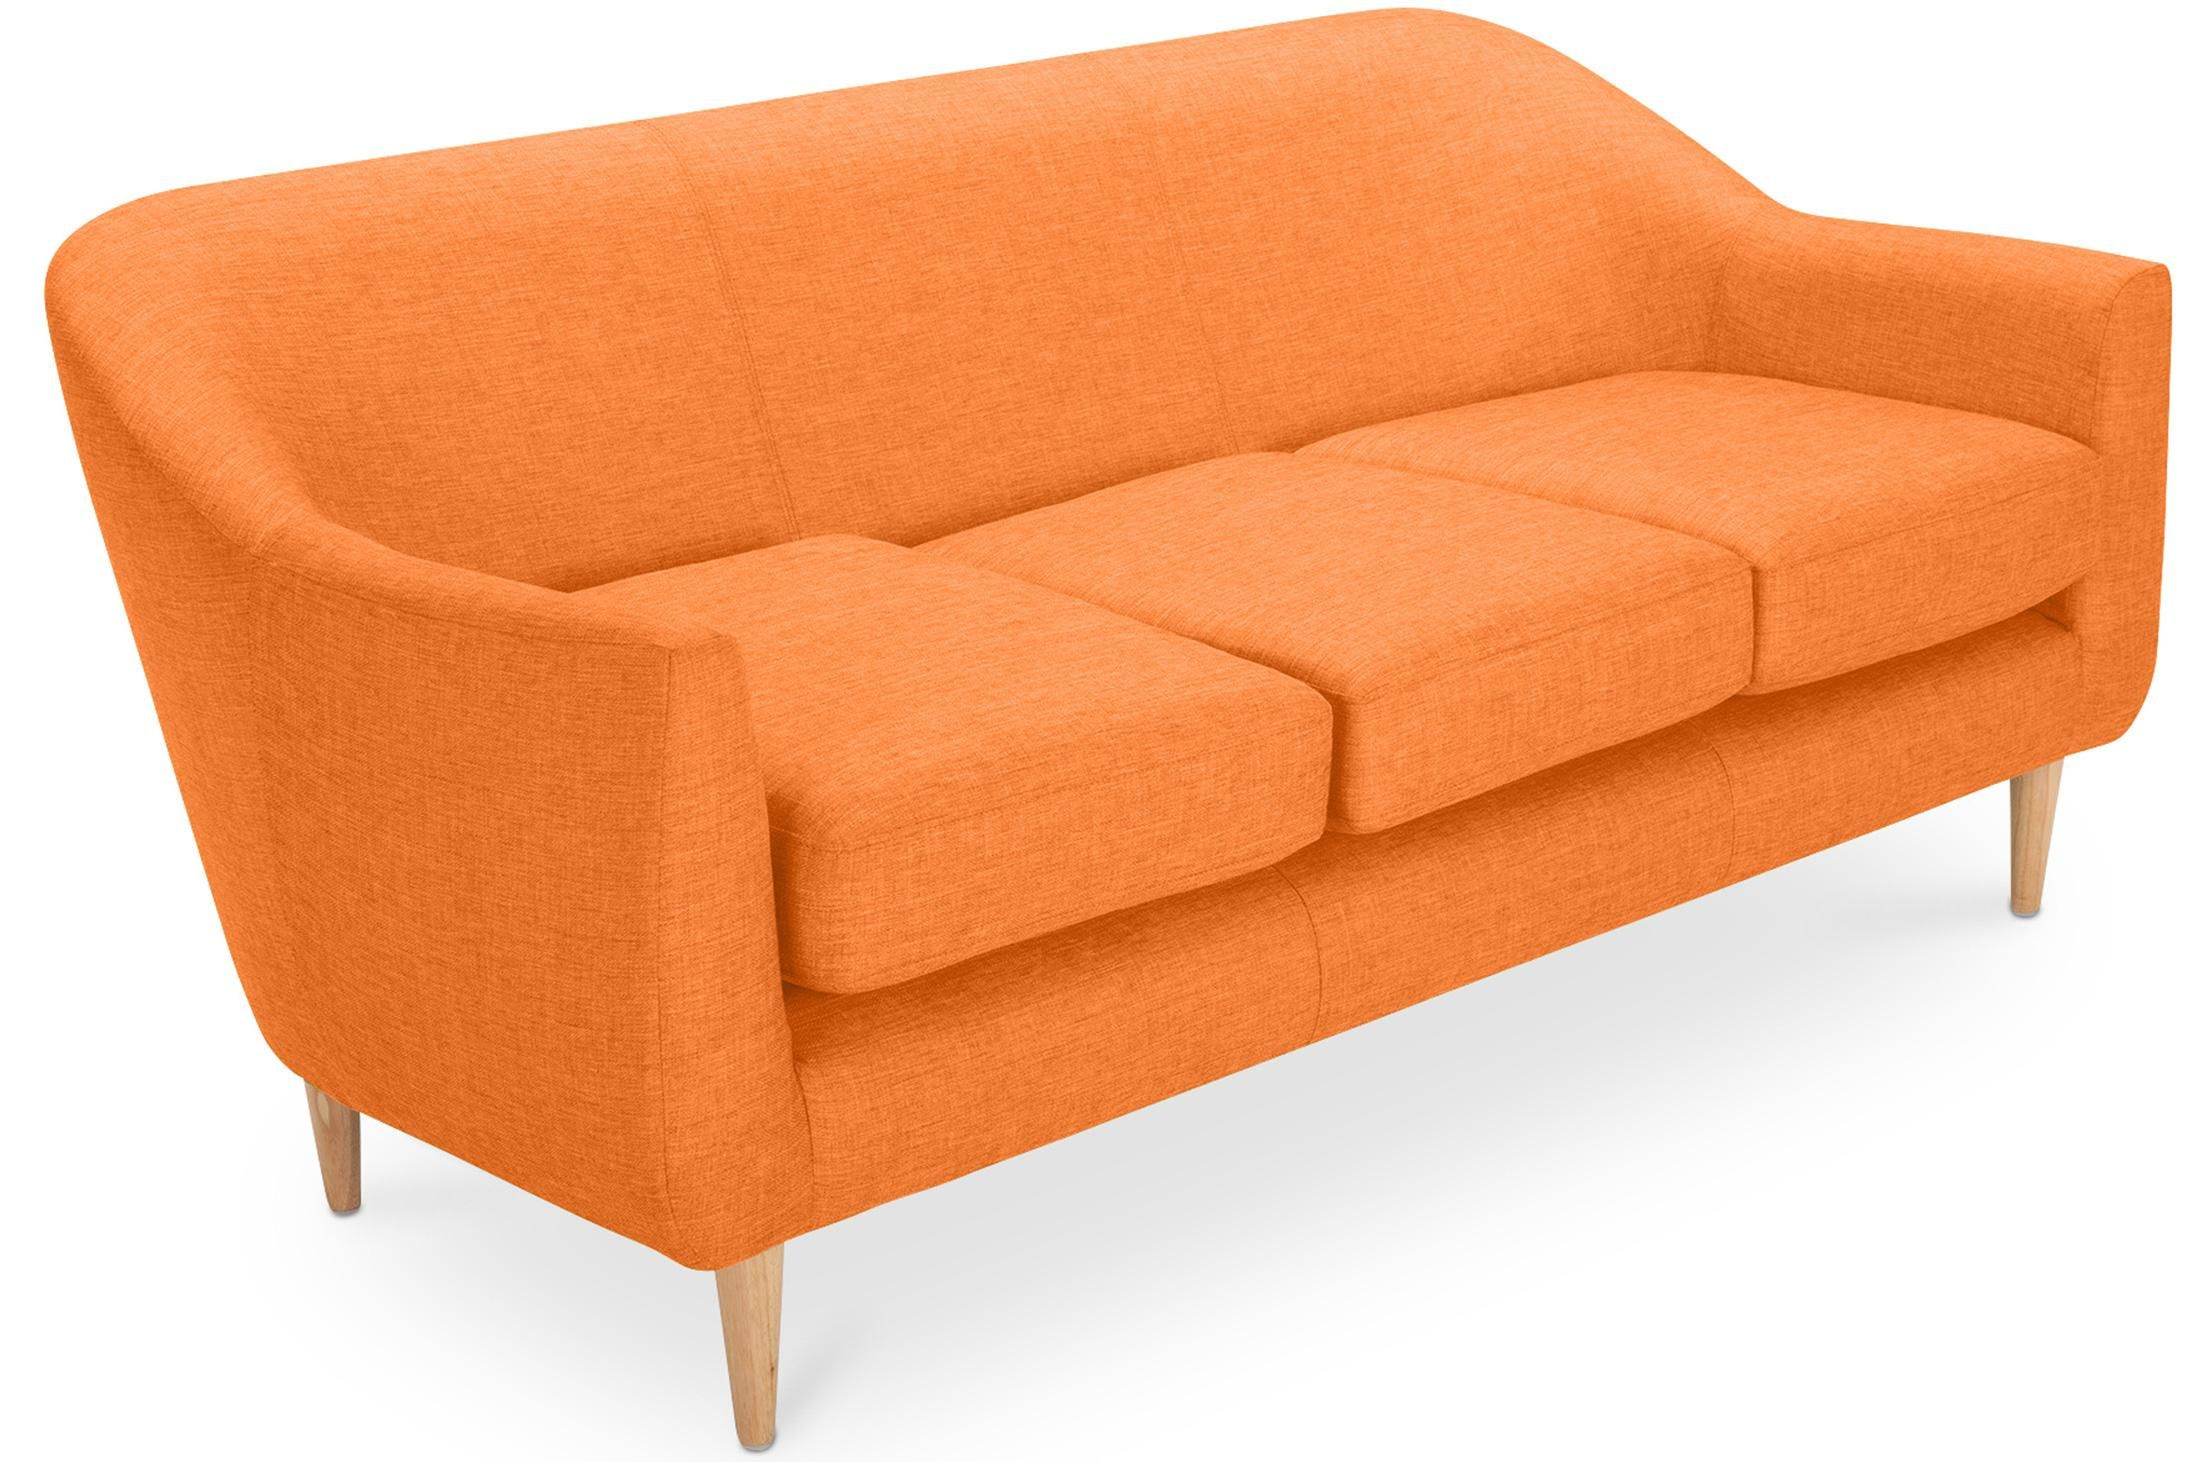 Canap tr s confortable - Canape tres confortable ...